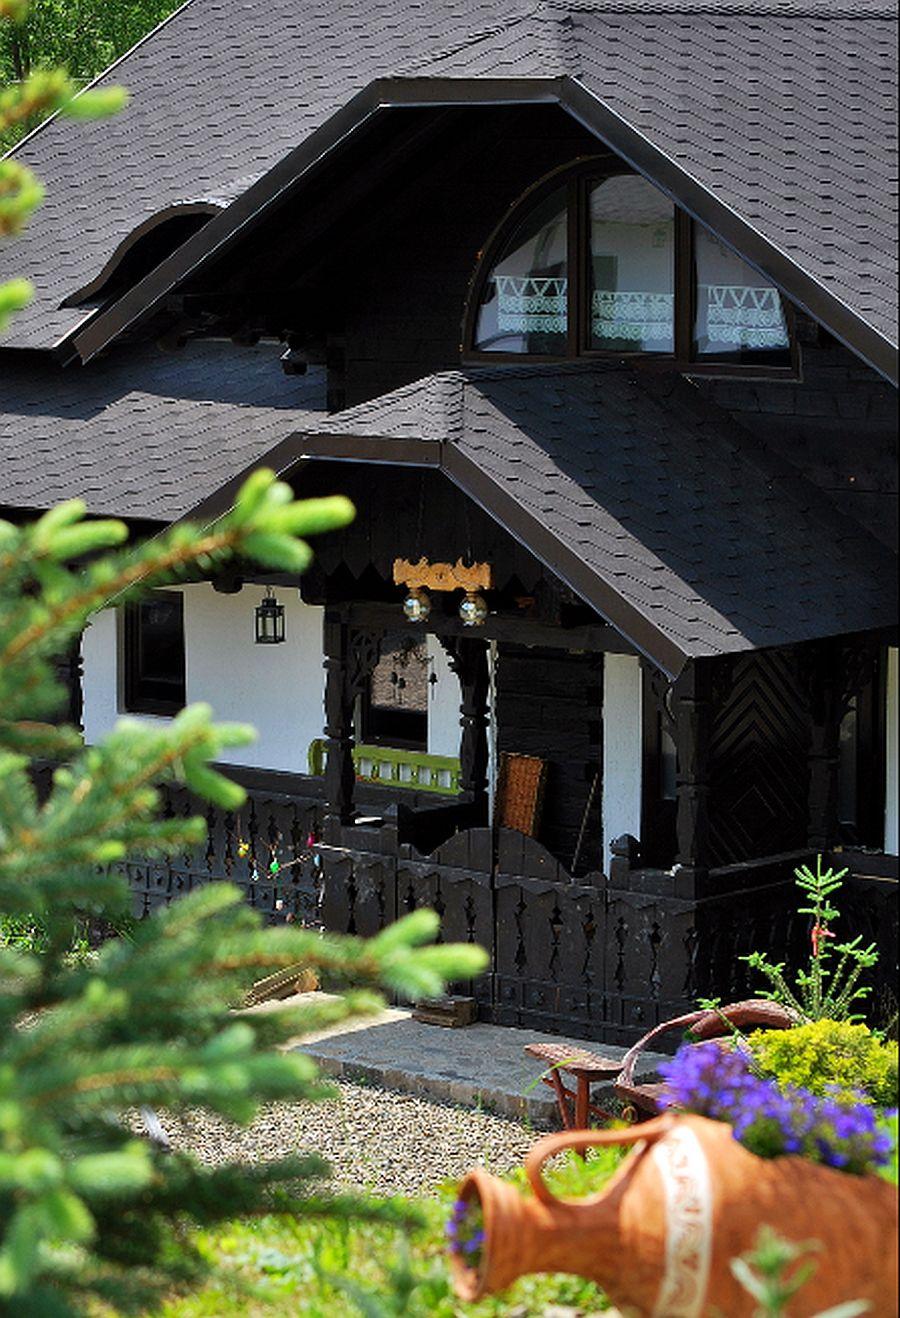 adelaparvu.com despre case traditionale romanesti, Casa Poveste, Campulung Moldovenesc, Romania, bedand breakfast Romania (49)